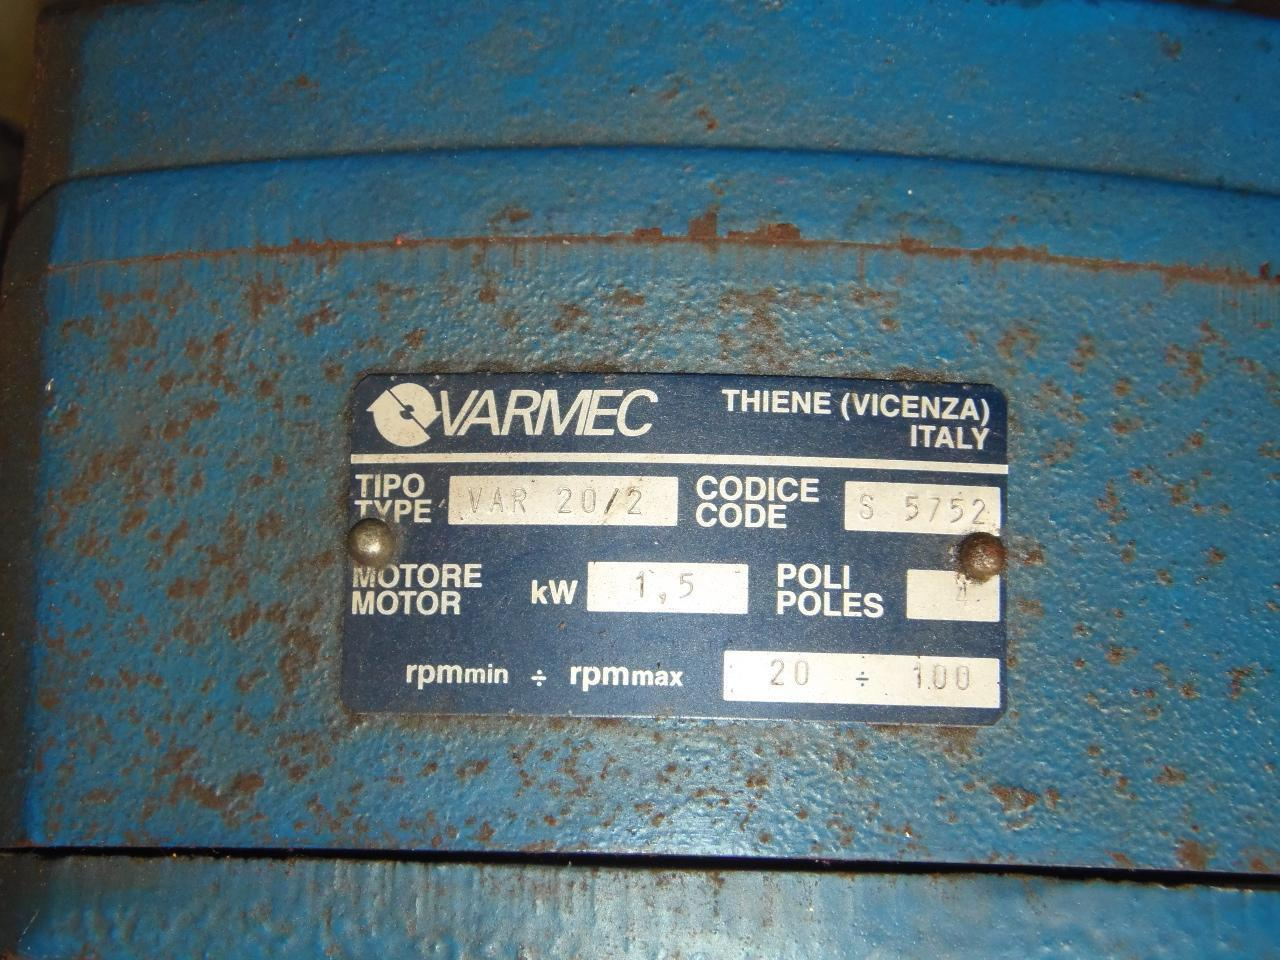 "9.44"" x 9.44"" FMB HORIZONTAL BANDSAW, MODEL ZEUS, 2000"